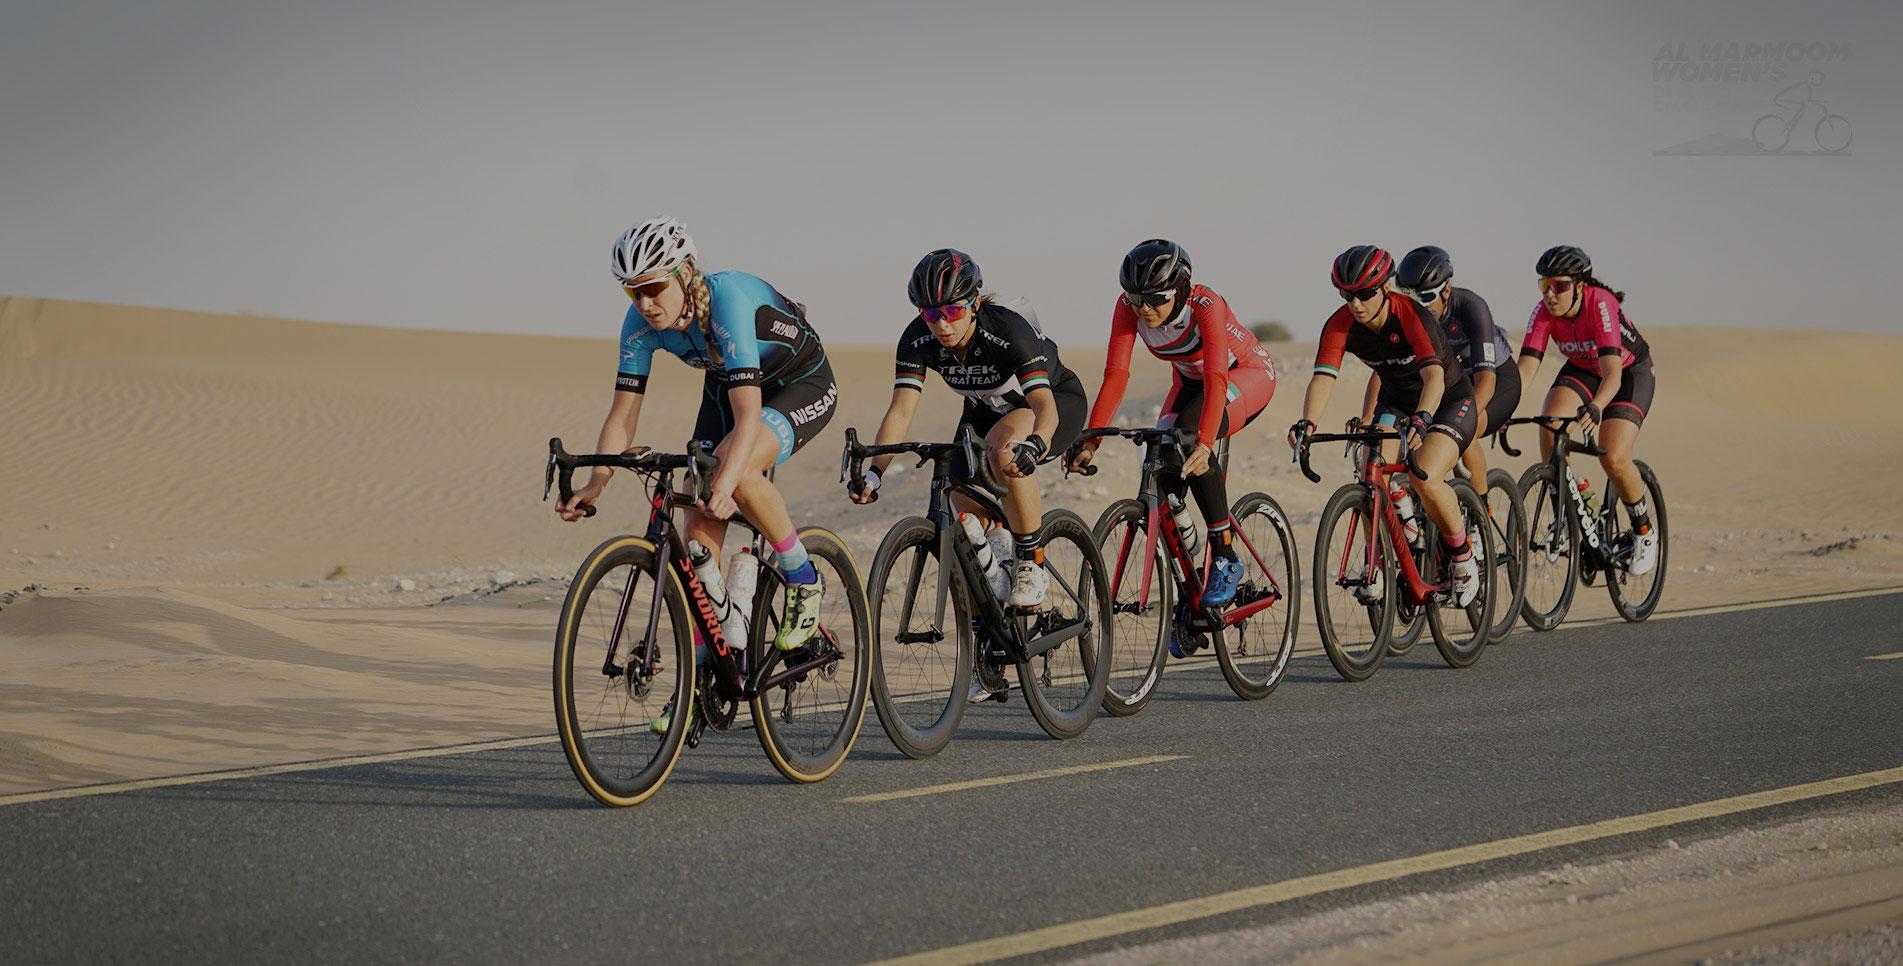 Al Marmoom Women's Cycling Challenge on Apr 10th at Al Qudra Cycle Track Dubai